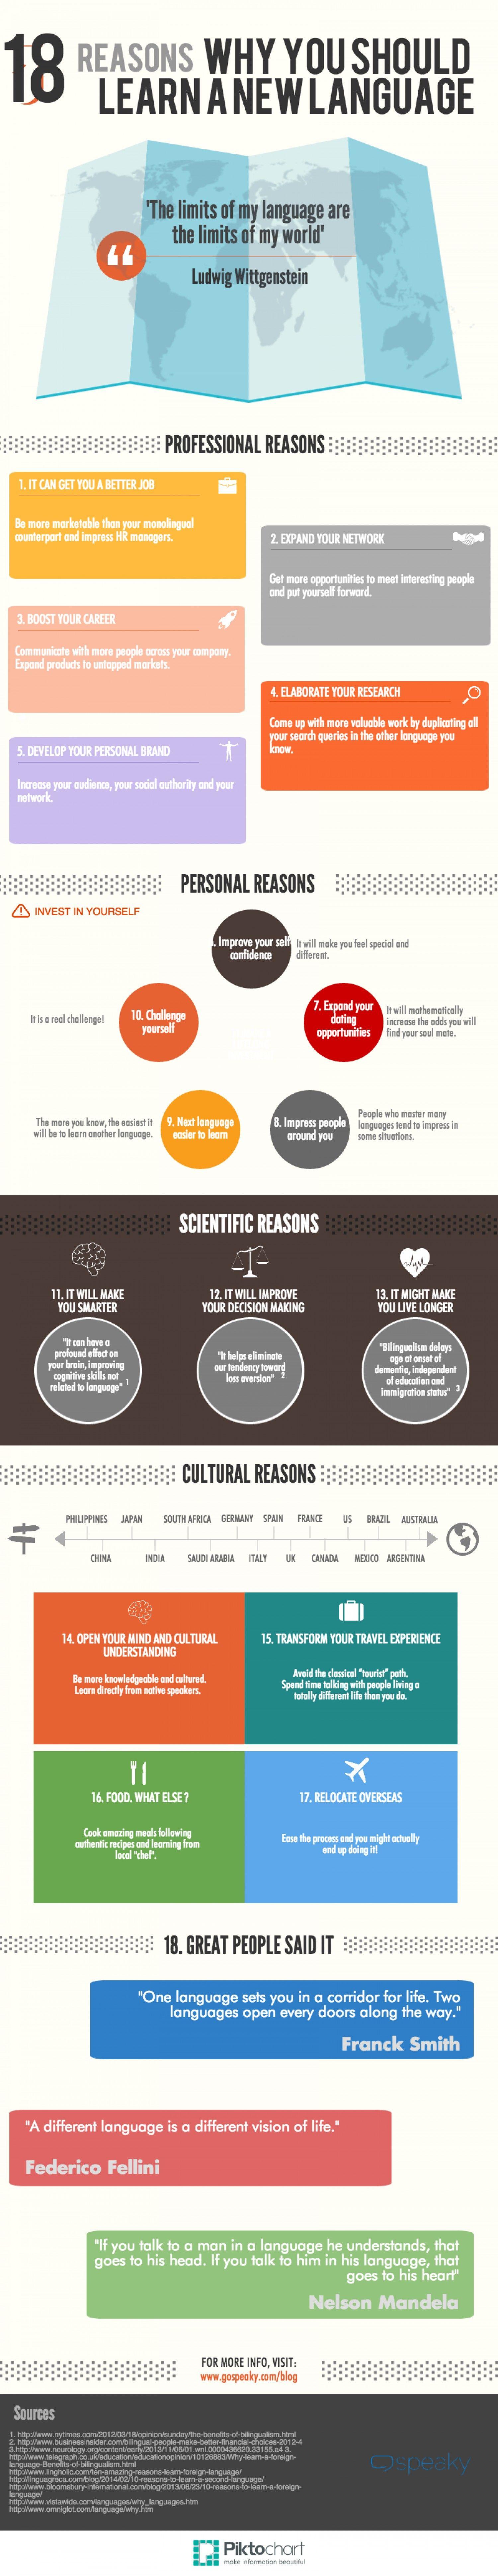 School of Languages | The New School